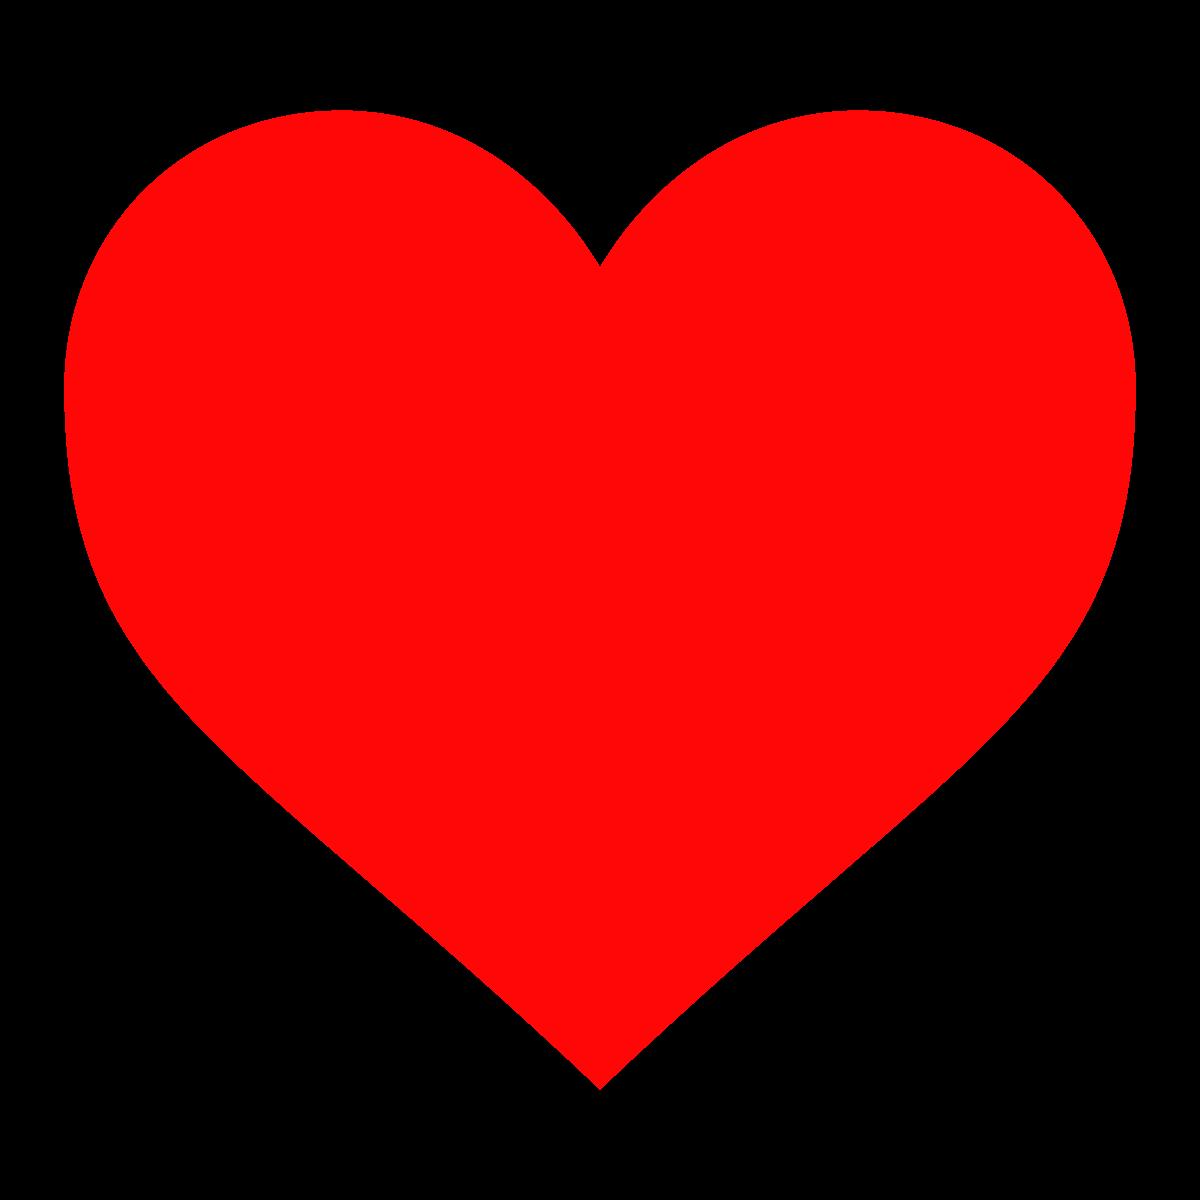 Love heart image free download best love heart image on 1200x1200 heart symbol buycottarizona